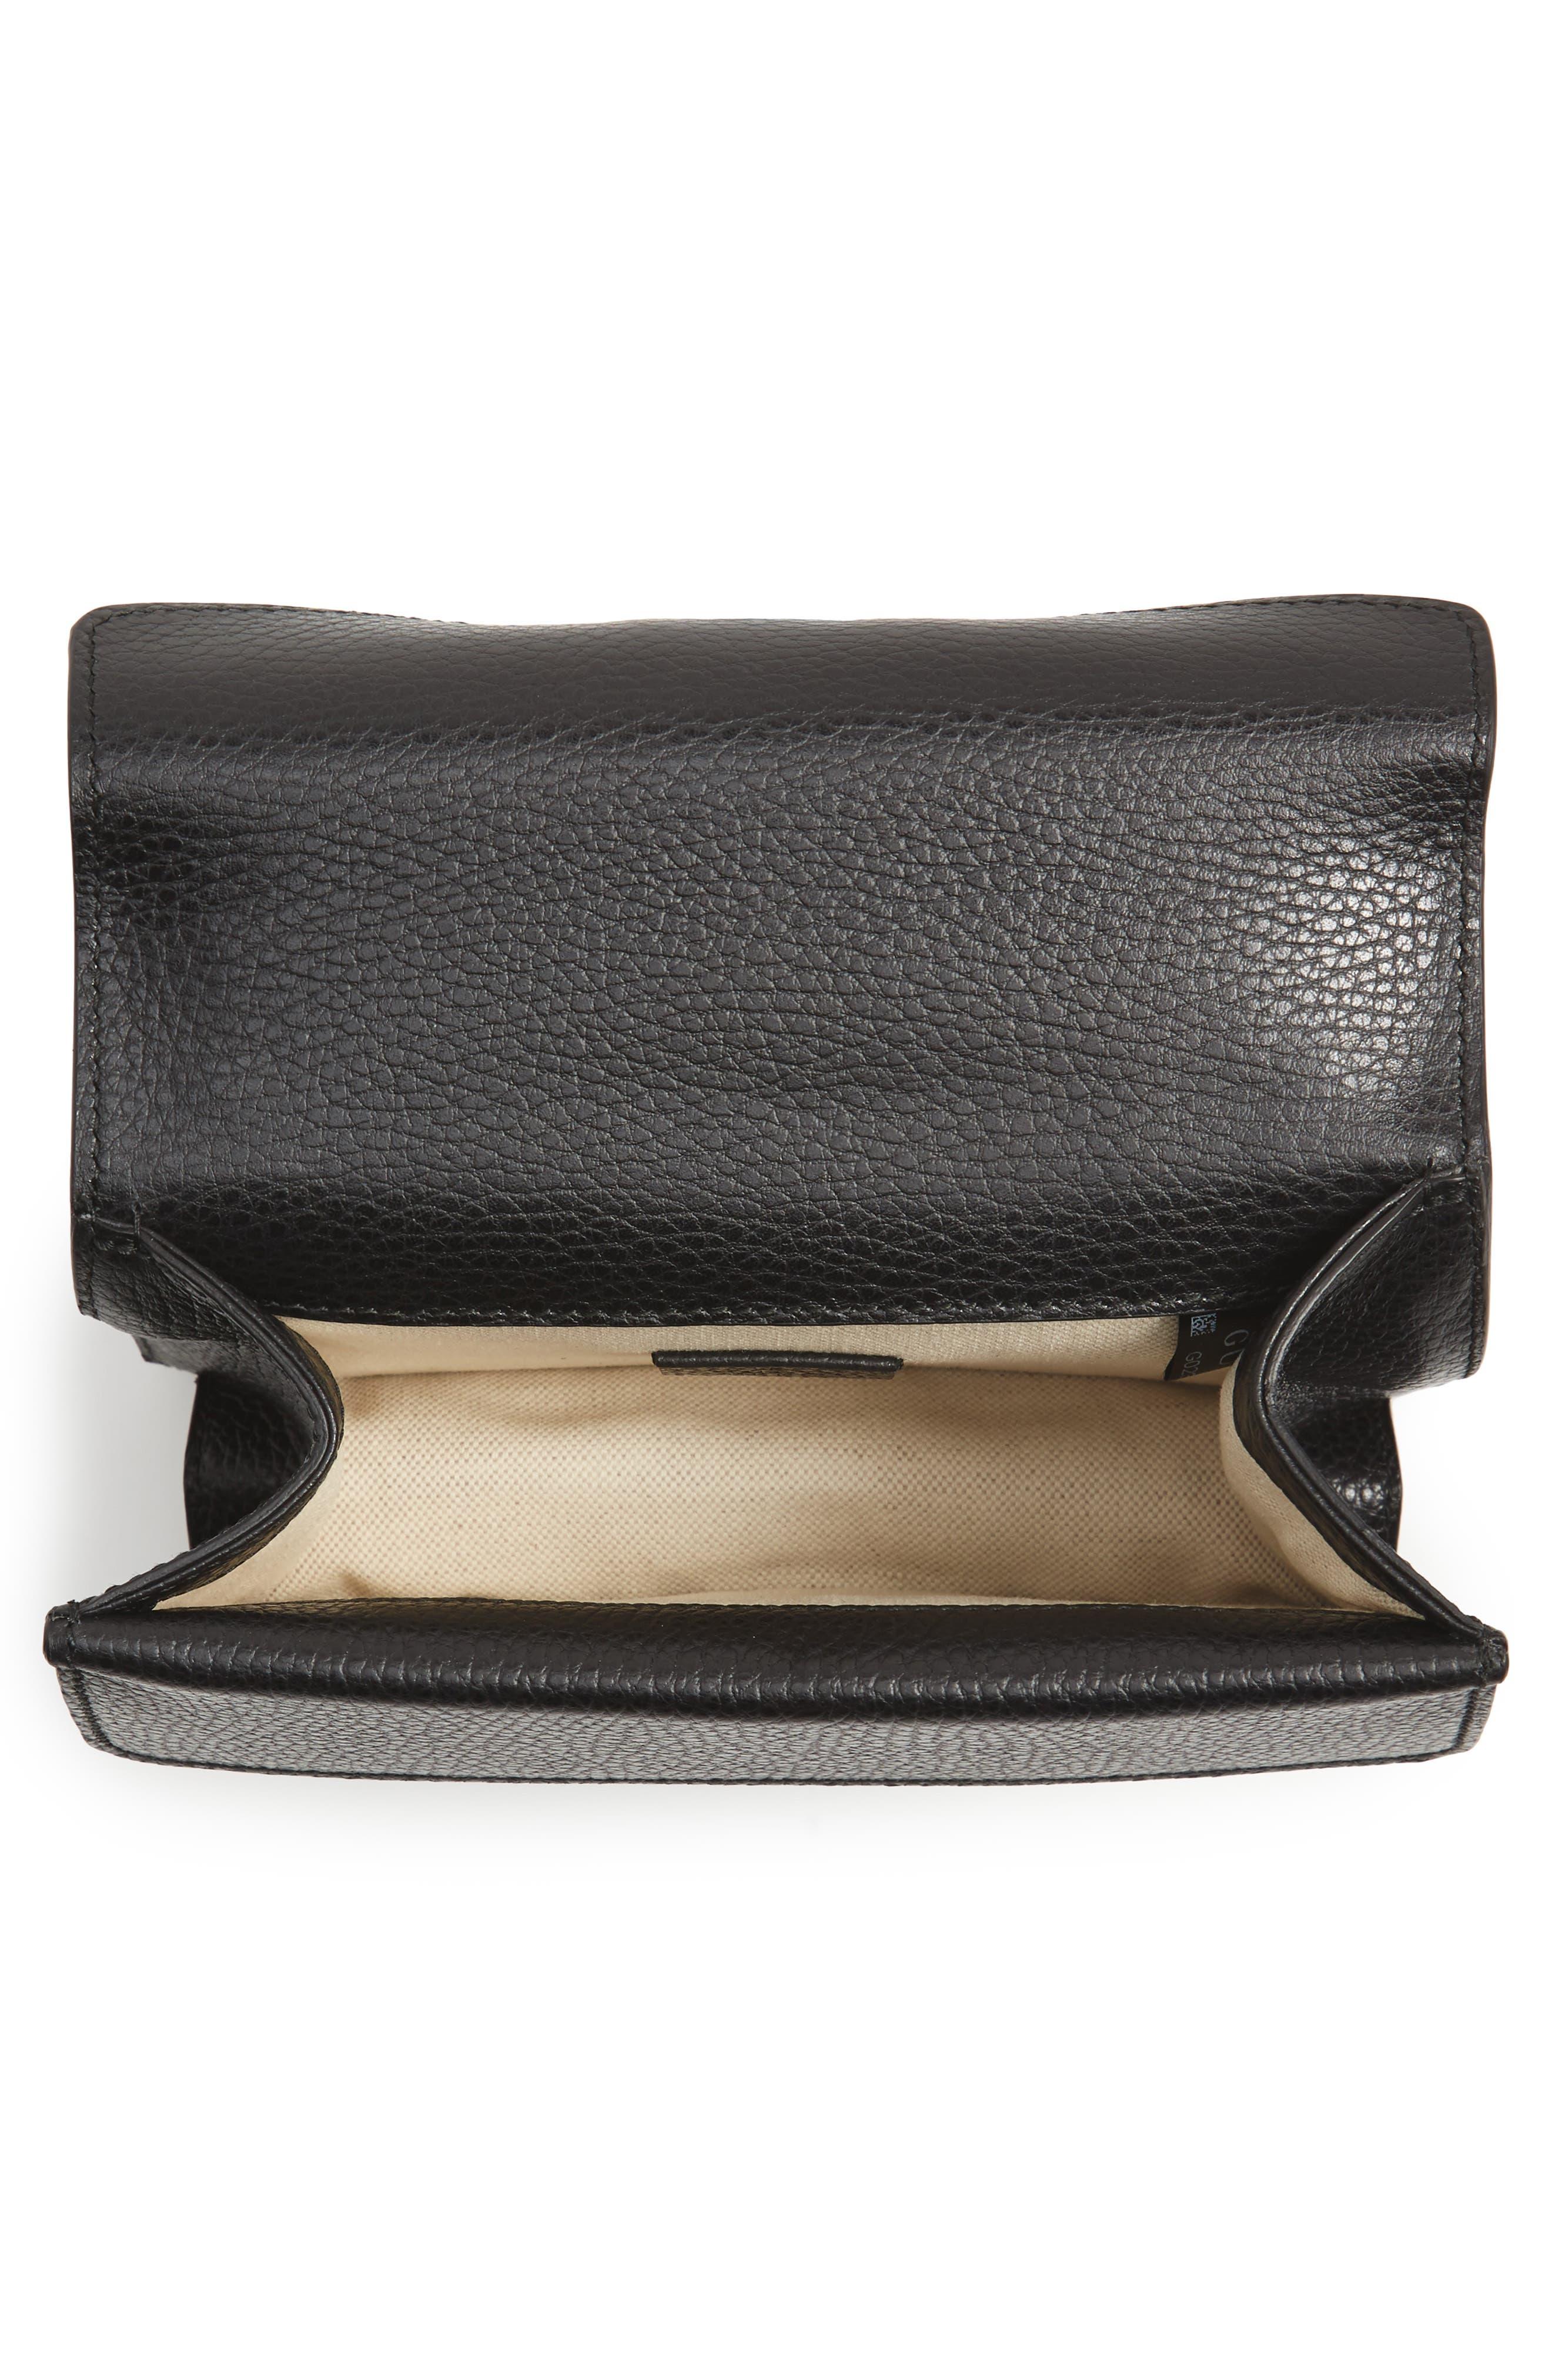 Mini Dionysus Leather Shoulder Bag,                             Alternate thumbnail 4, color,                             NERO/ BLACK DIAMOND